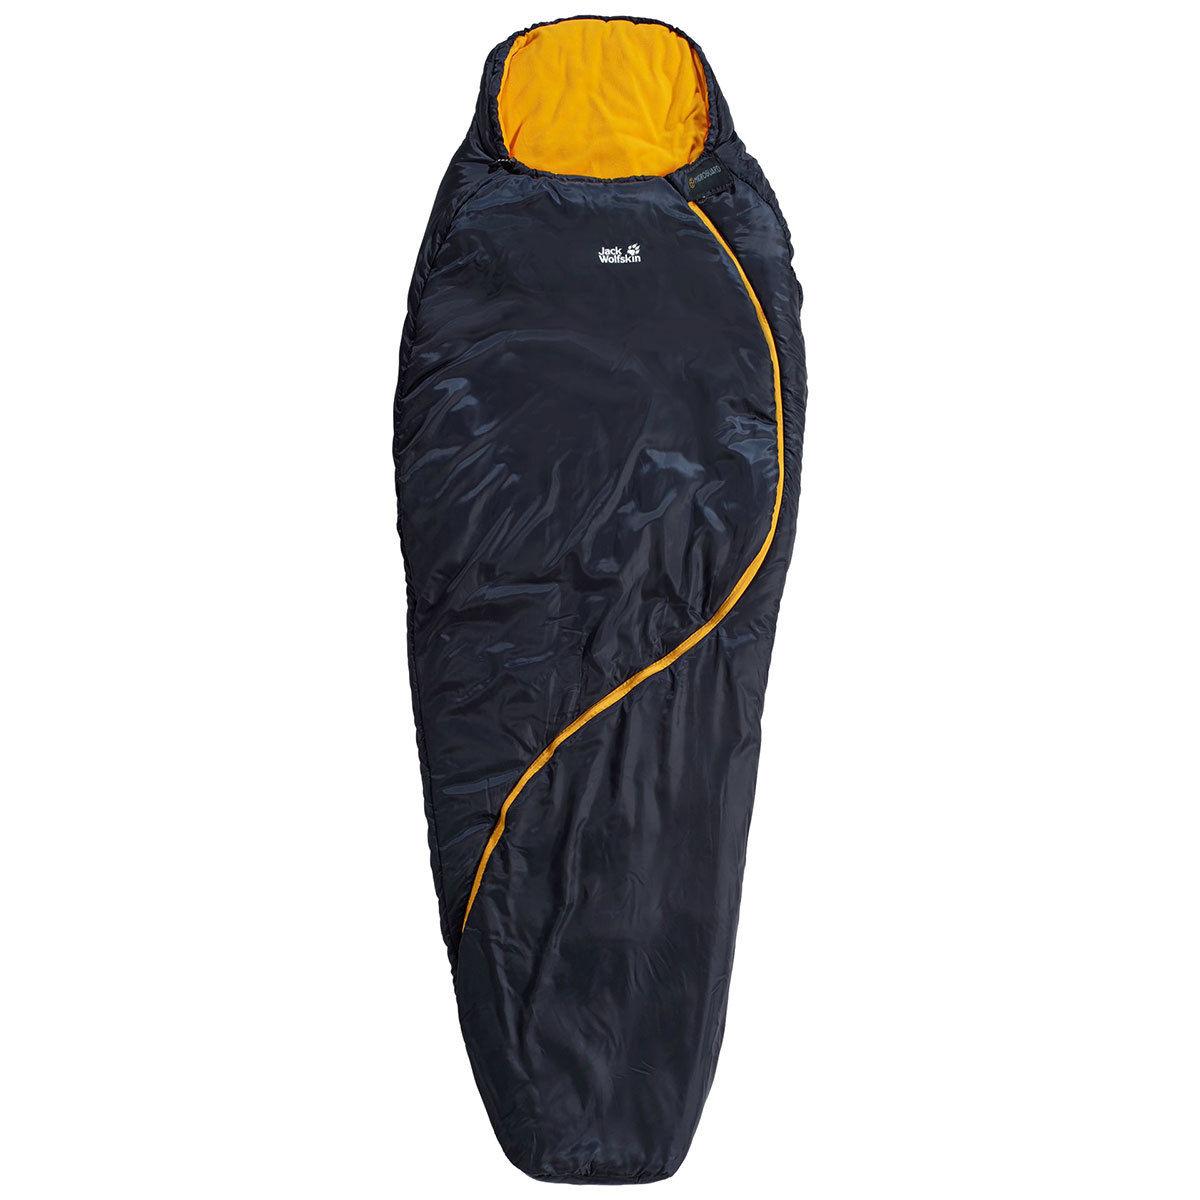 photo: Jack Wolfskin Women's Smoozip -5C/23F 3-season synthetic sleeping bag